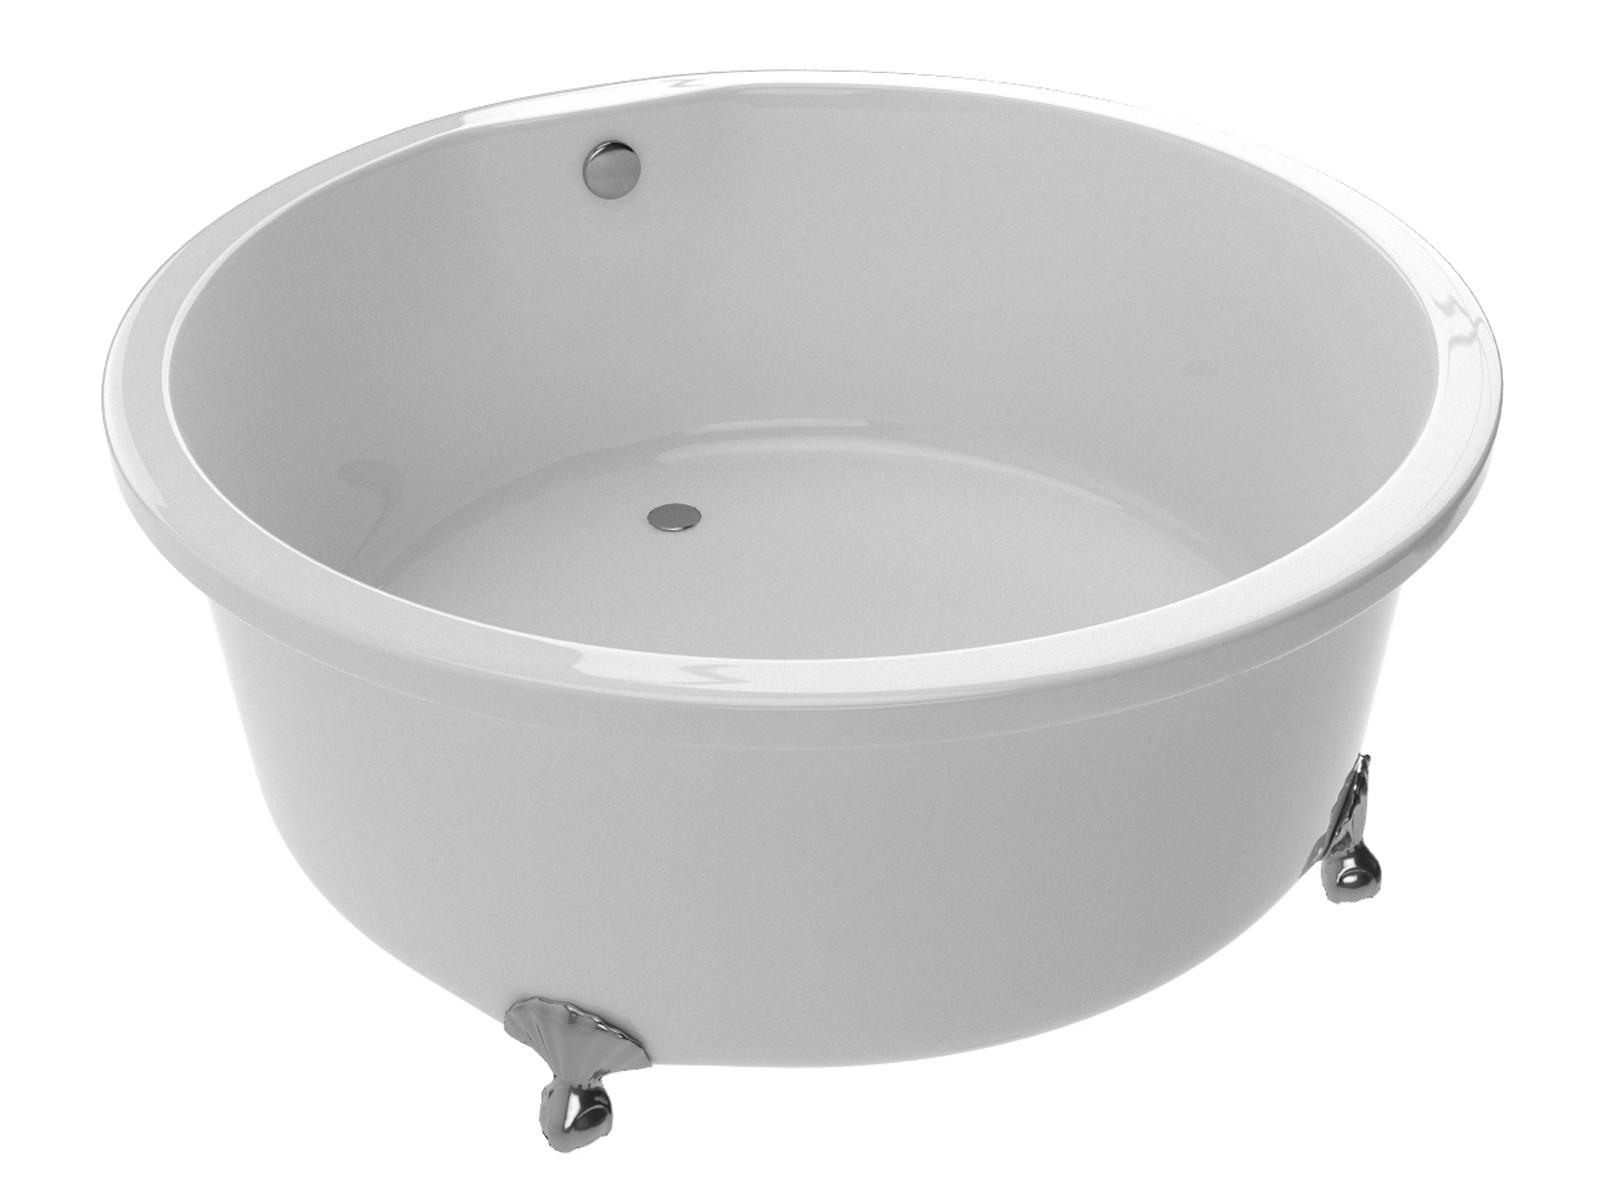 Anzzi FT-AZ302 Cantor Series 4.9 ft. Clawfoot Non-Whirlpool Bathtub - White